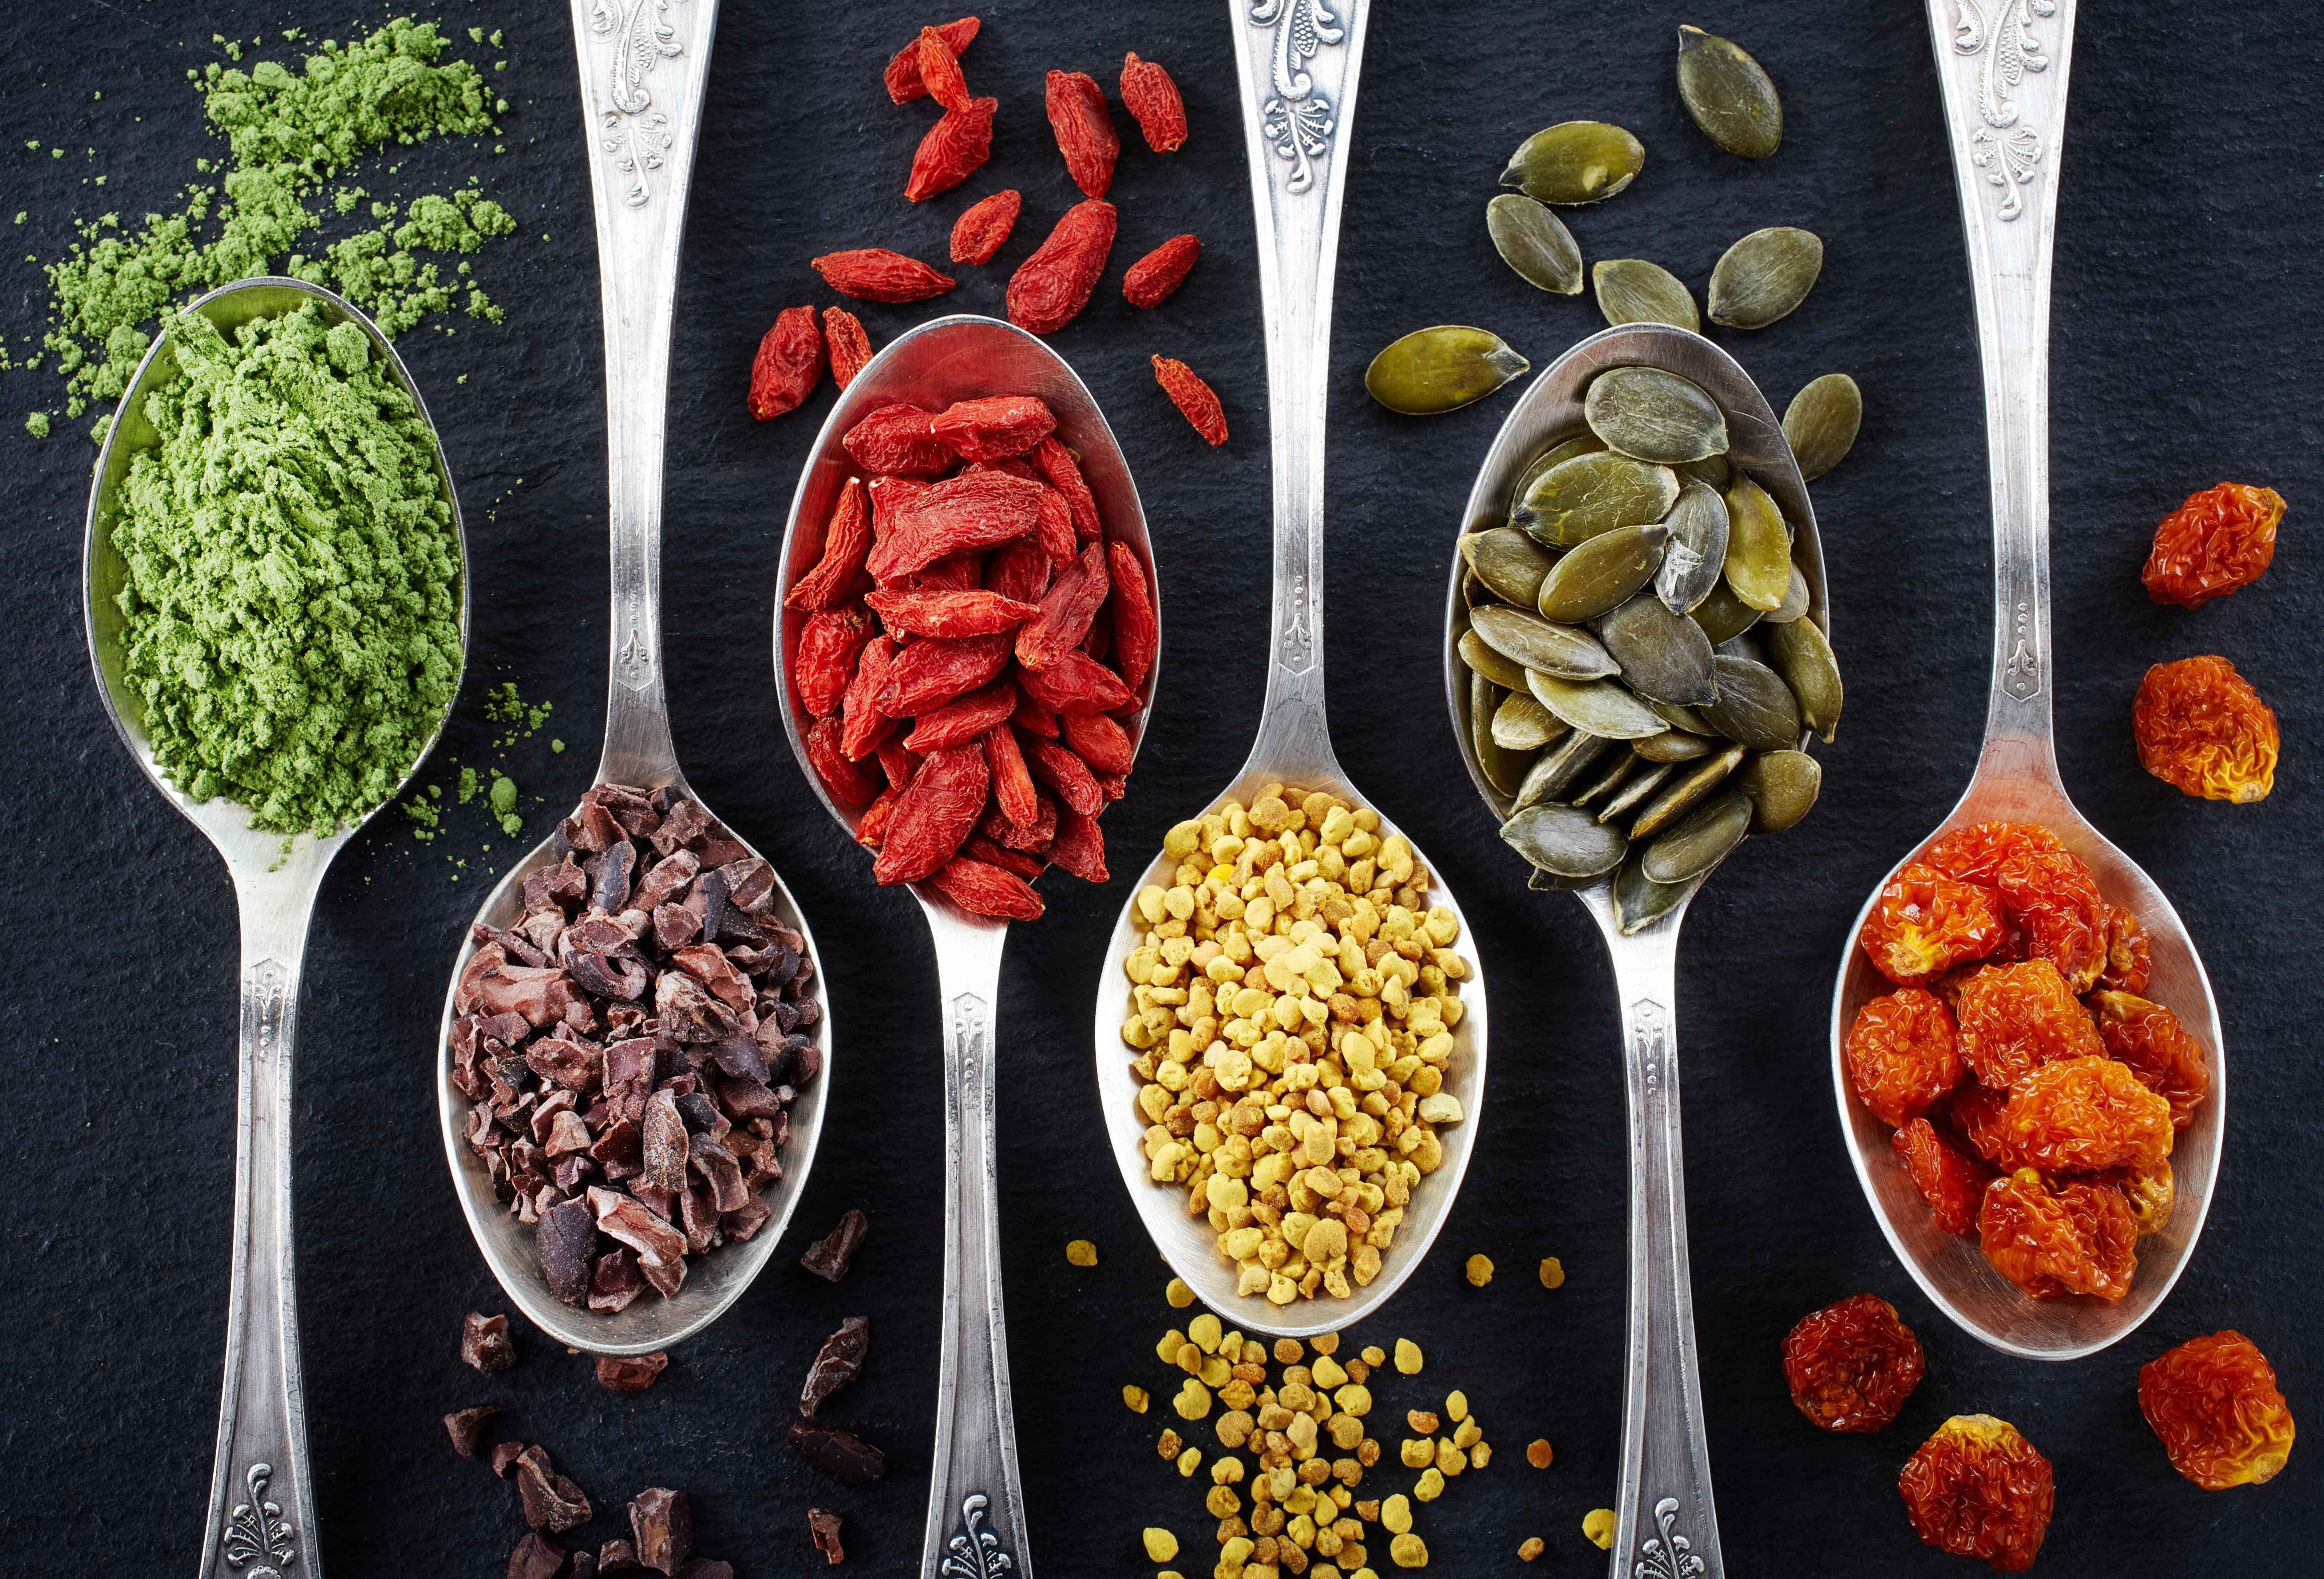 Superpotraviny – jedinečné zdravé potraviny